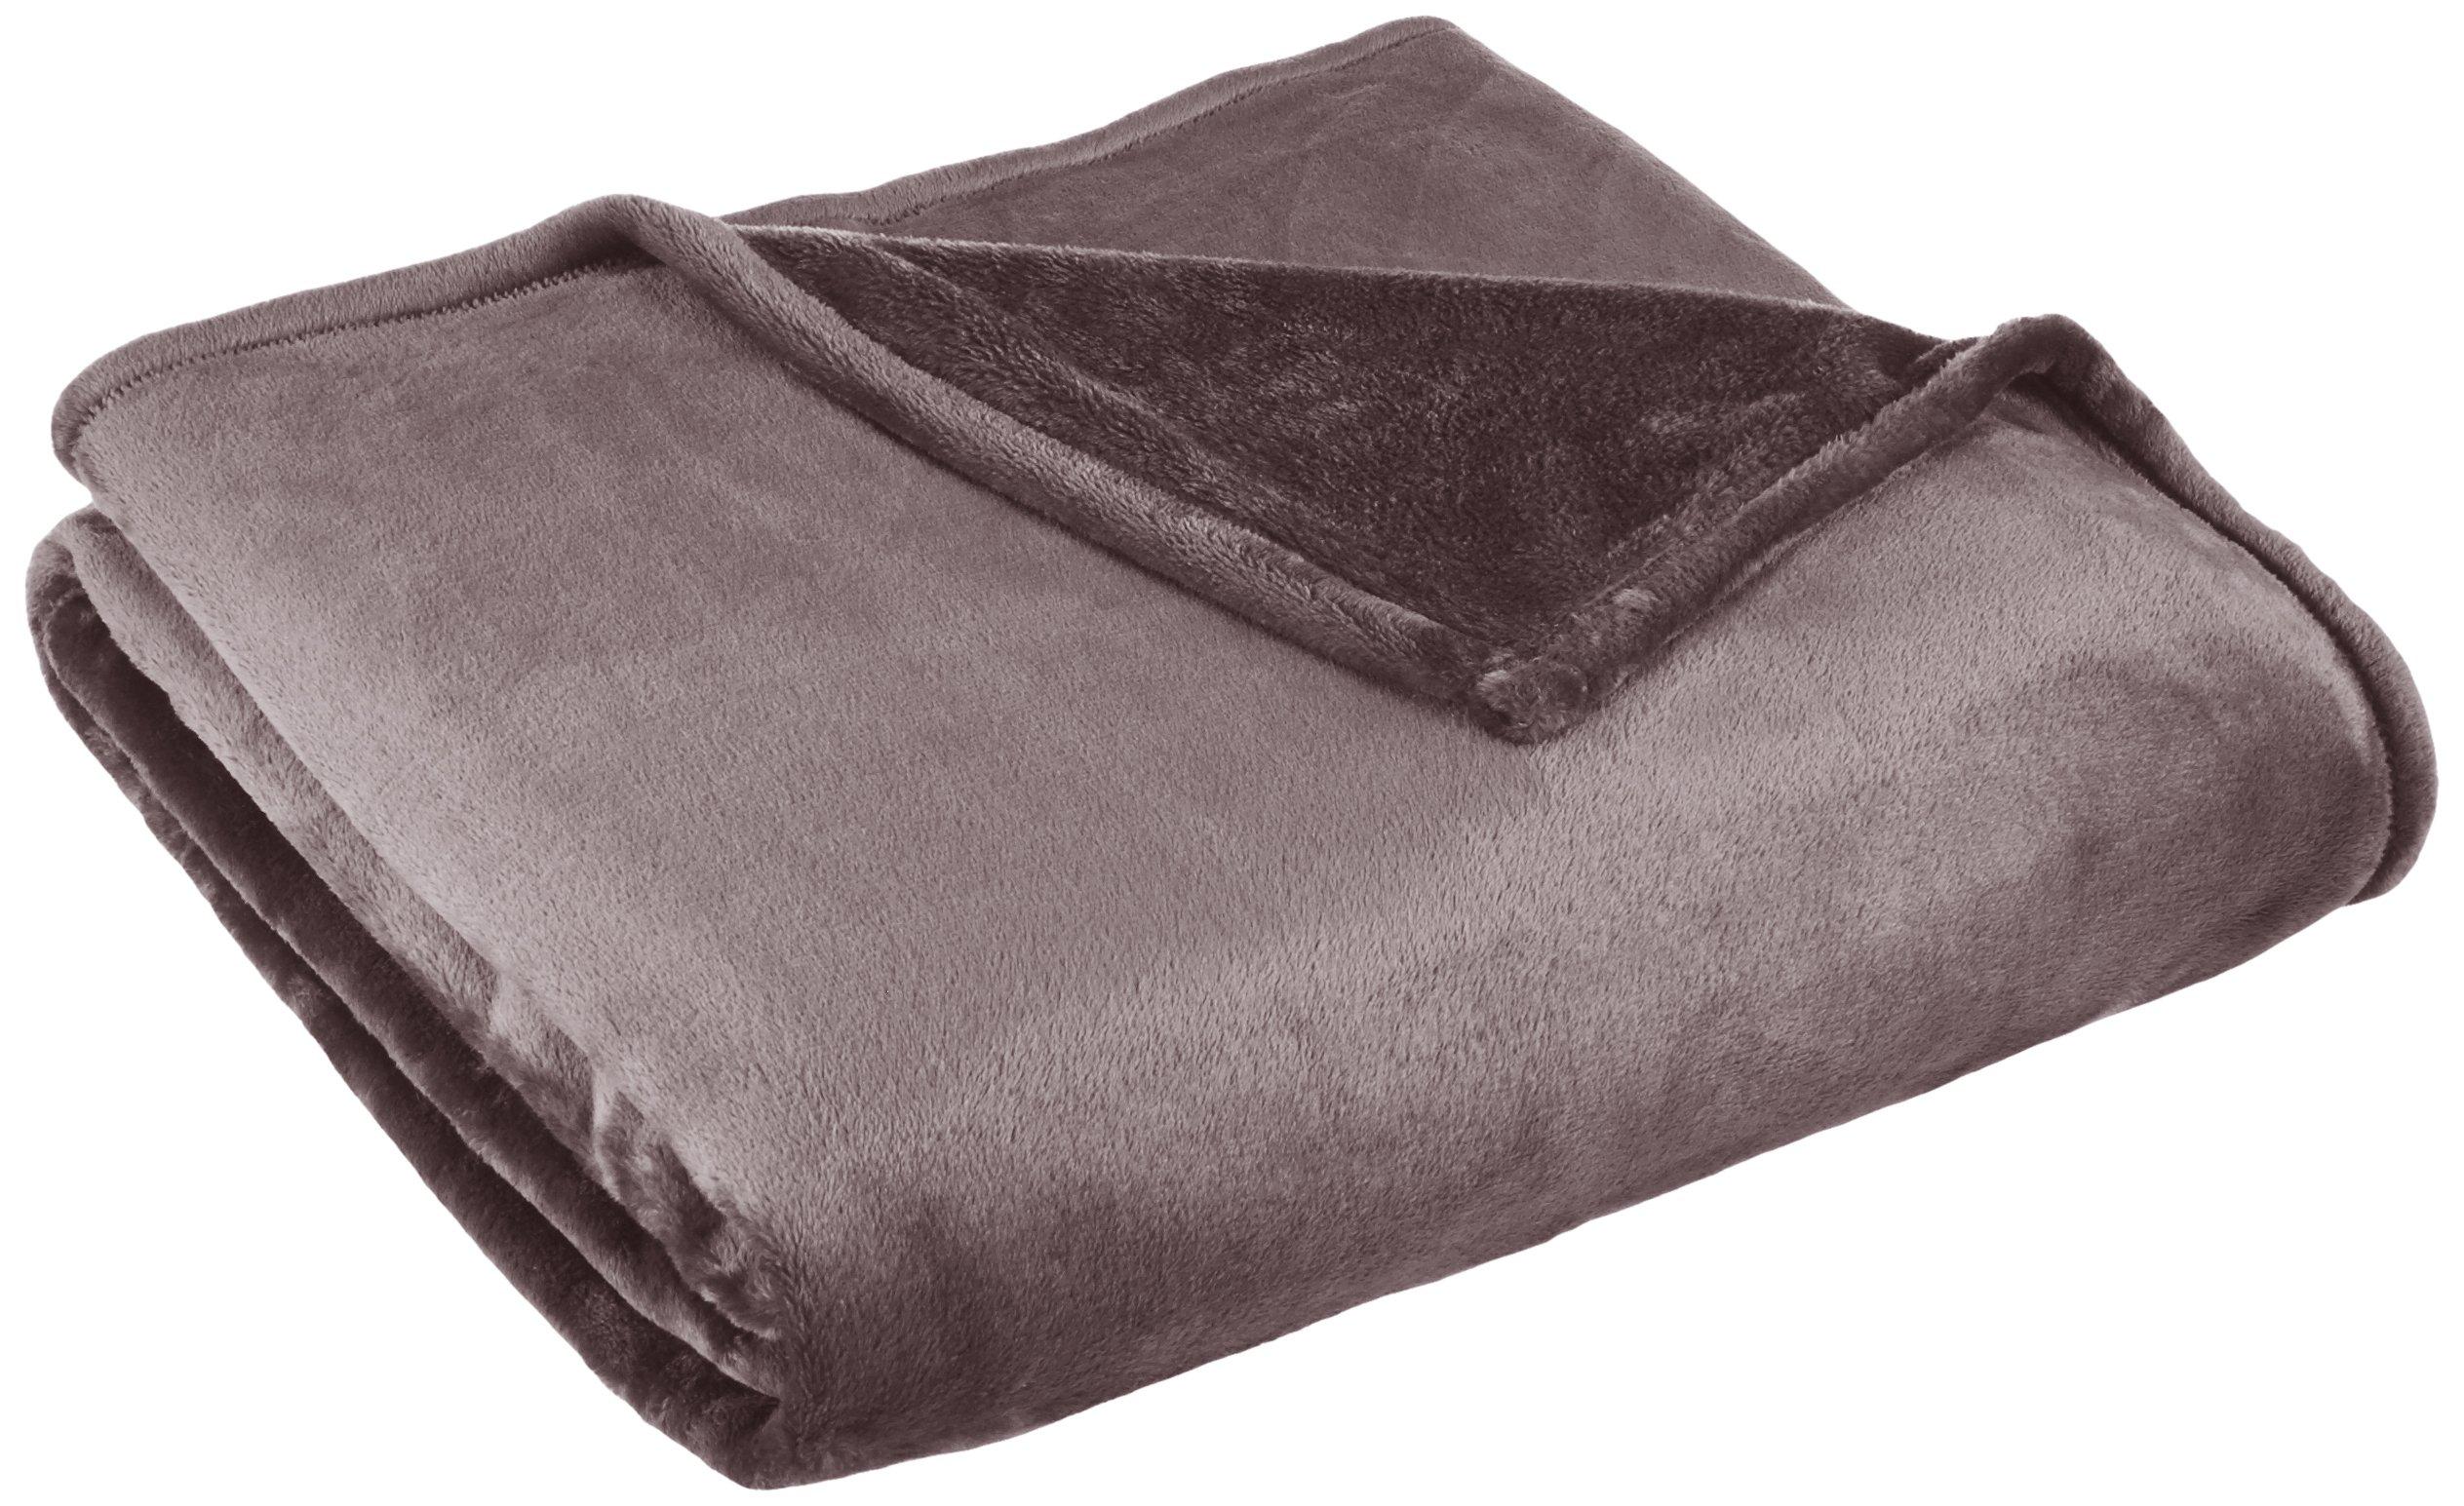 Northpoint, Cashmere Plush Velvet Blanket, Full/Queen, Charcoal